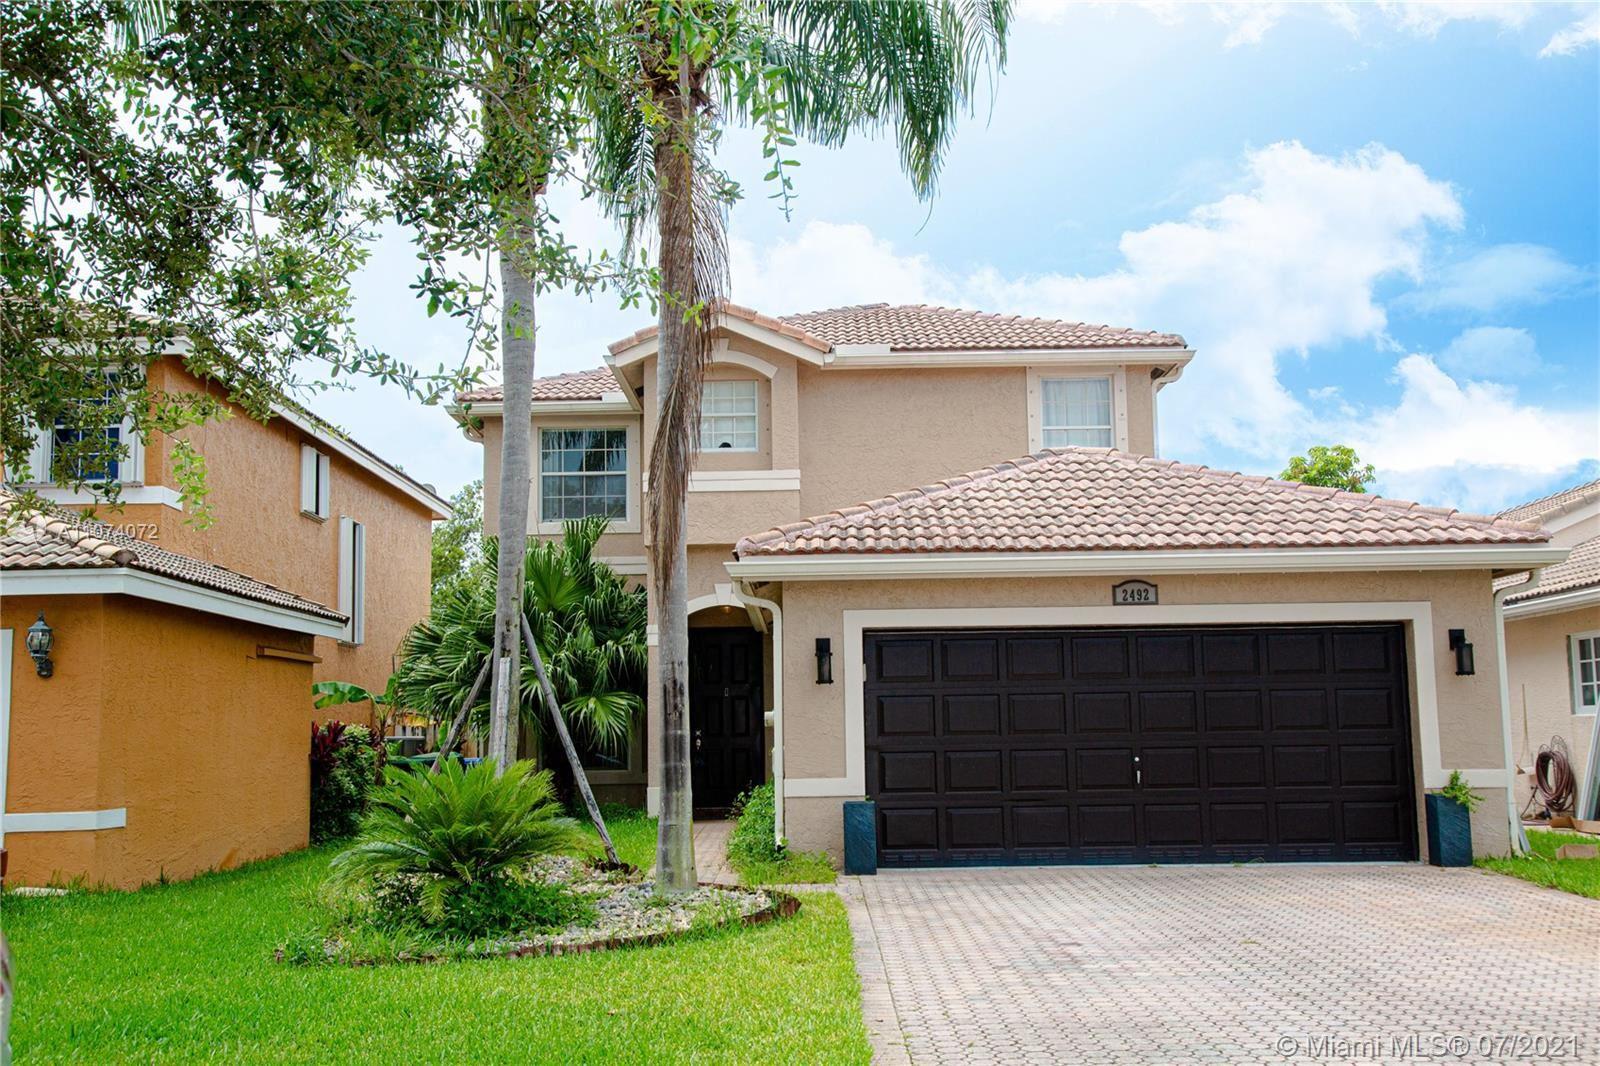 Photo of 2492 SW 161st Ave, Miramar, FL 33027 (MLS # A11074072)